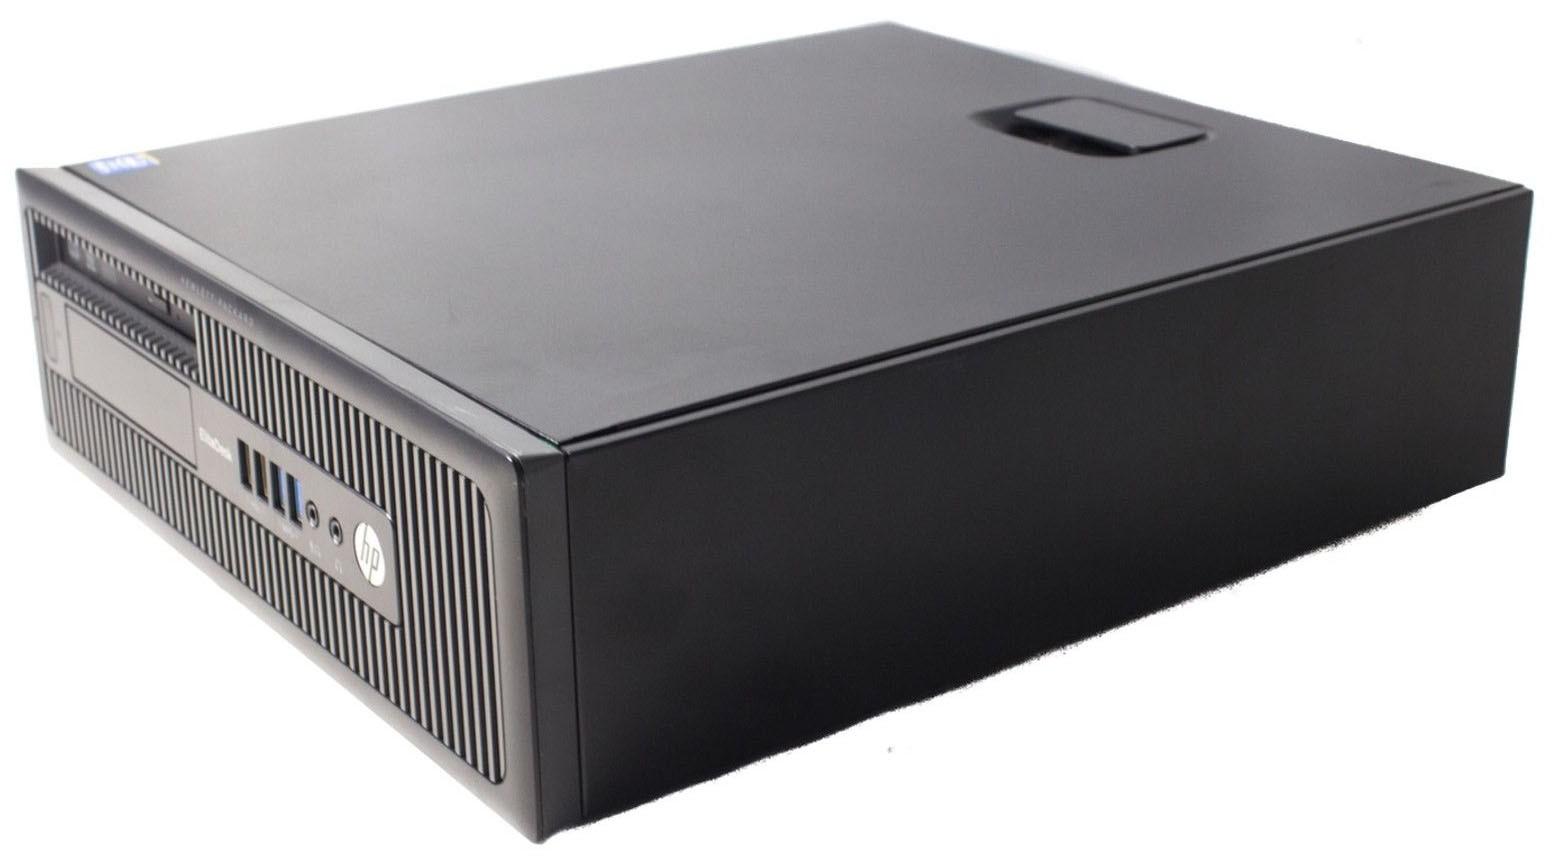 HP-ELITEDESK-800-G1-i7-HP EliteDesk 800 G1 SFF Intel Core i7 8 GB RAM 1 TB HDD Windows 10 Pro 1 YEAR WARRANTY*-image